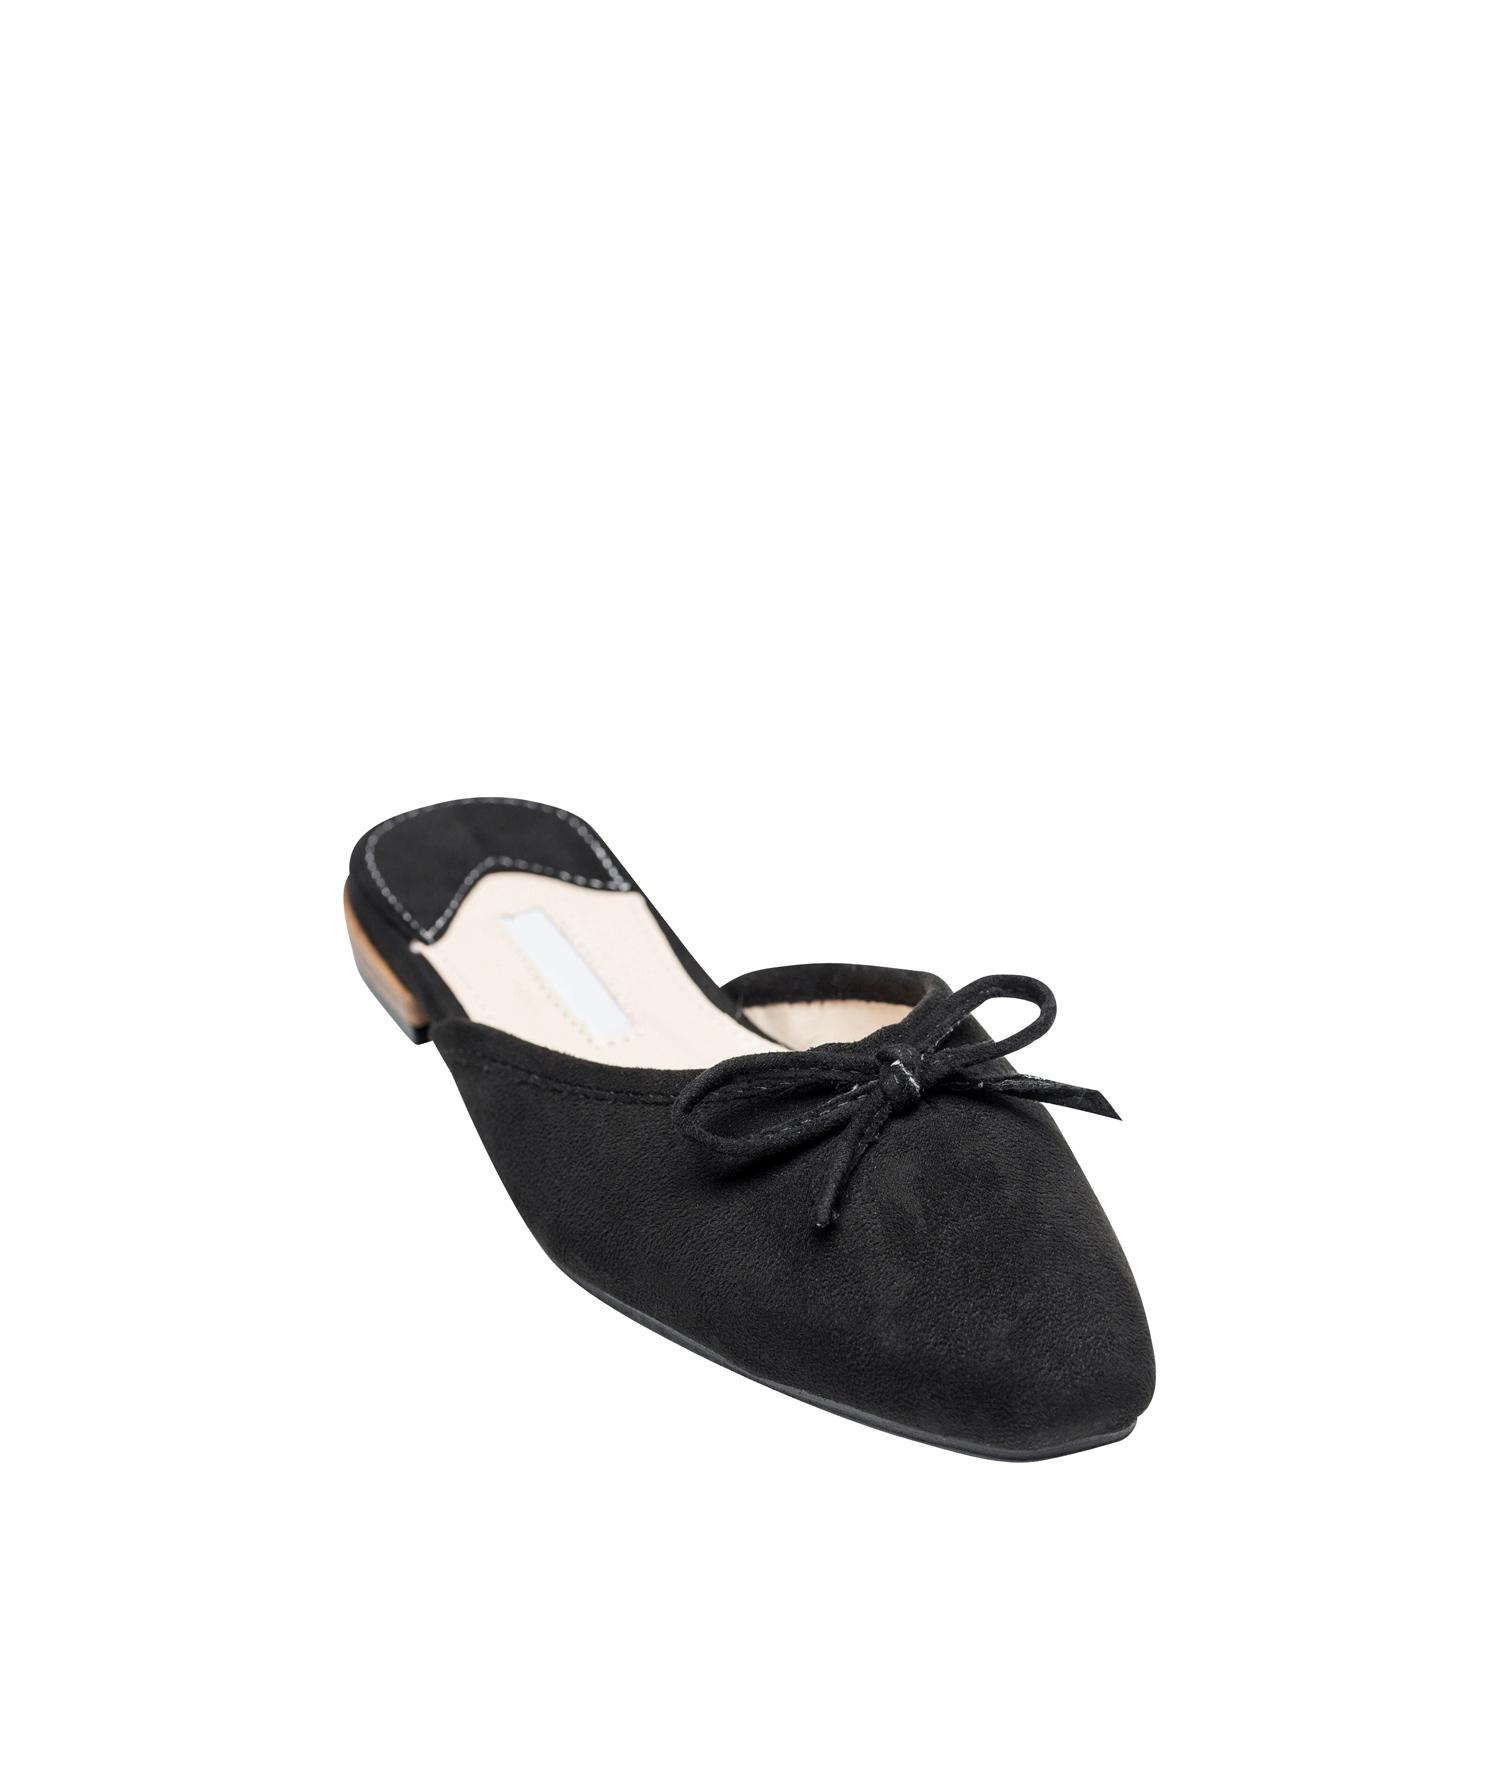 Cute Bow Ballet Flat Mules